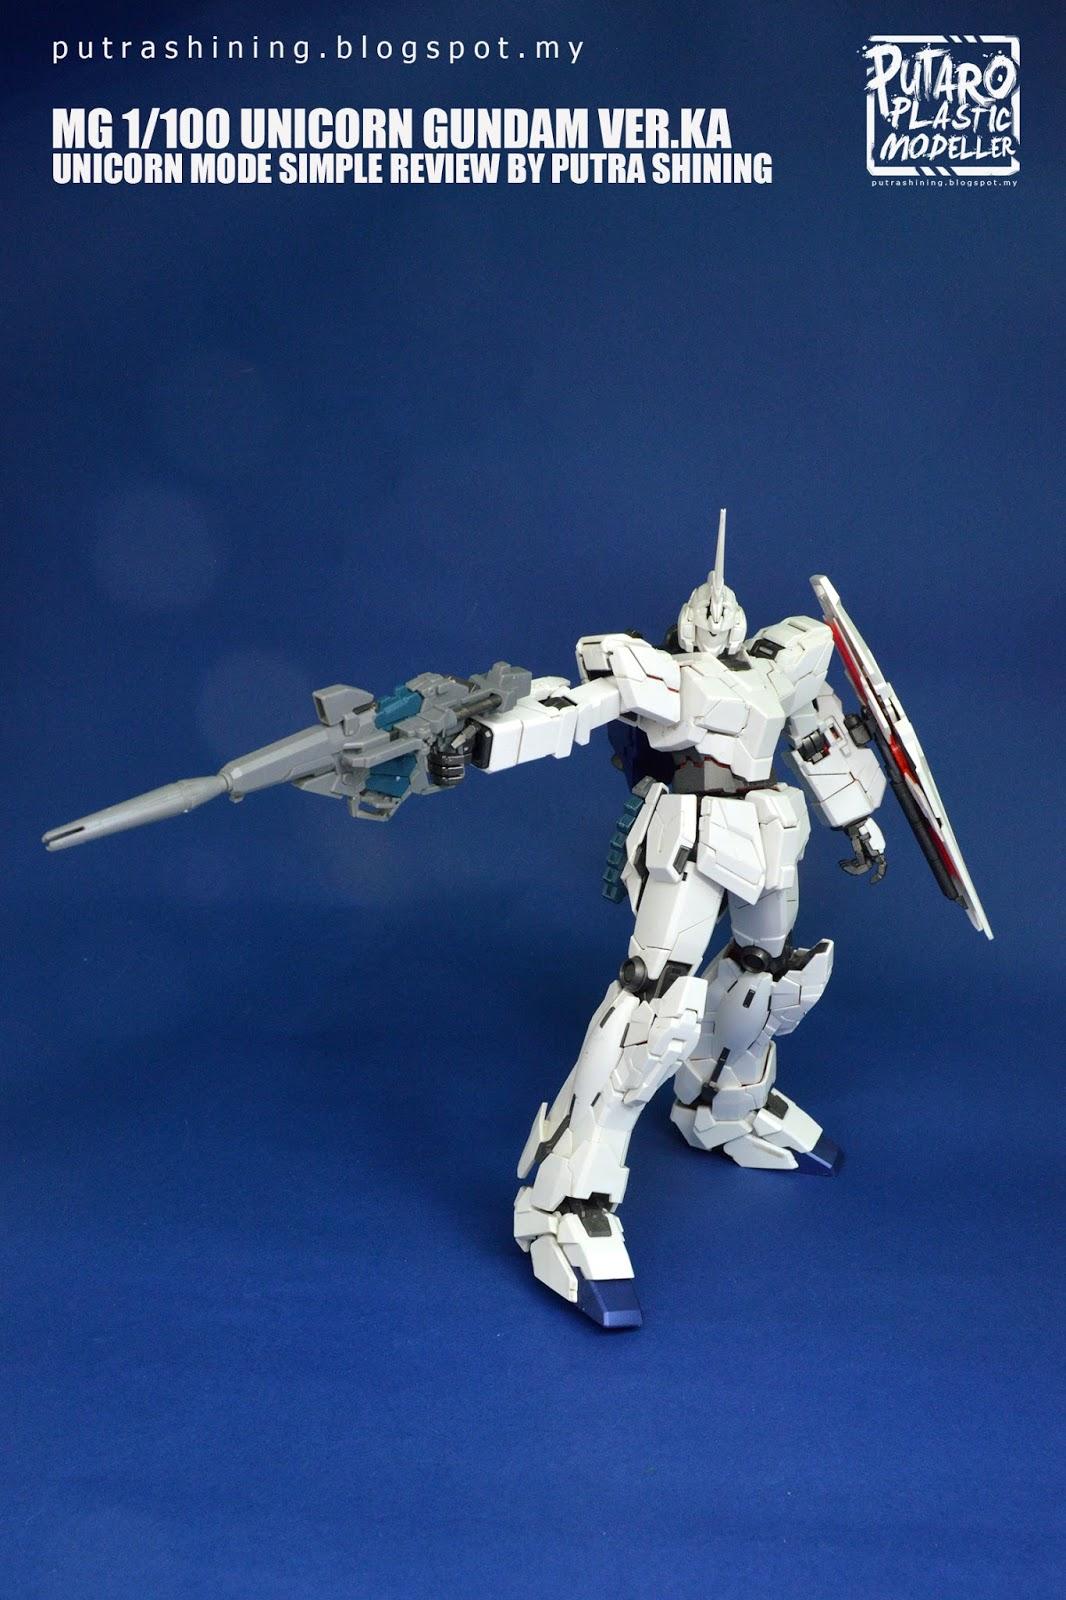 Mg 1 100 Unicorn Gundam Verka Review Mode By Putra Rx78 2 114215